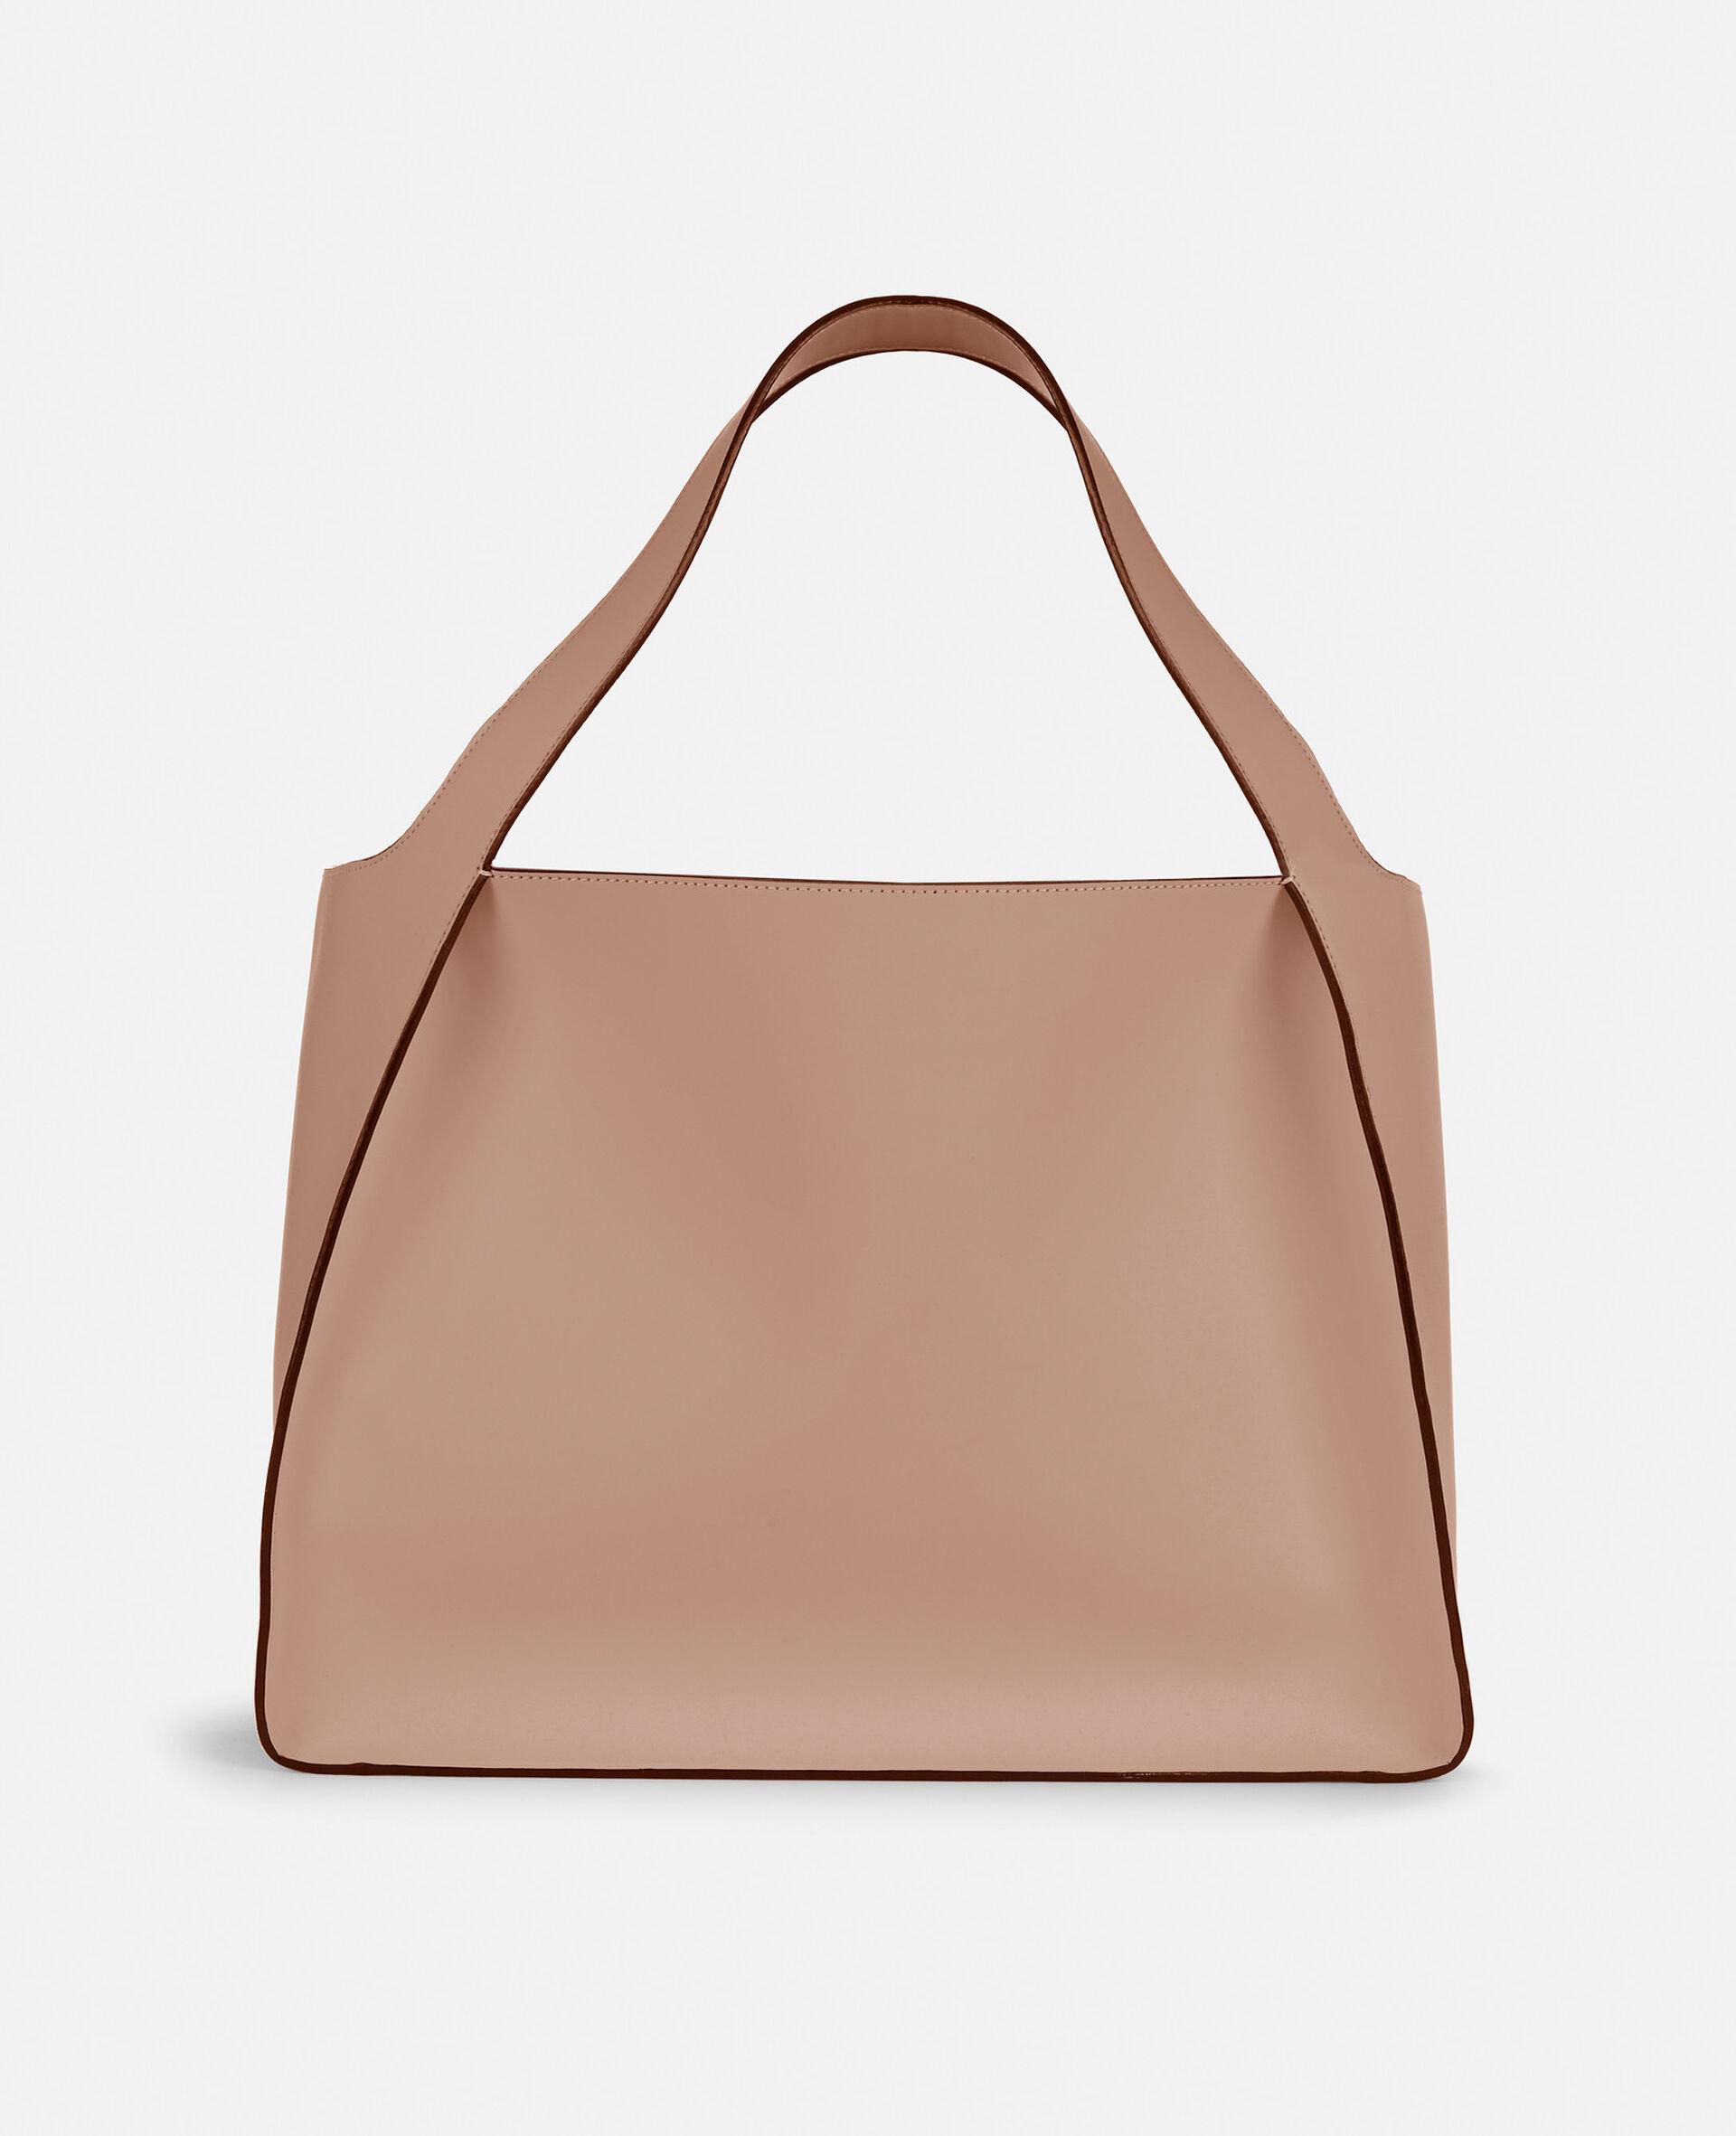 Stella Logo Tote Bag-Brown-large image number 2